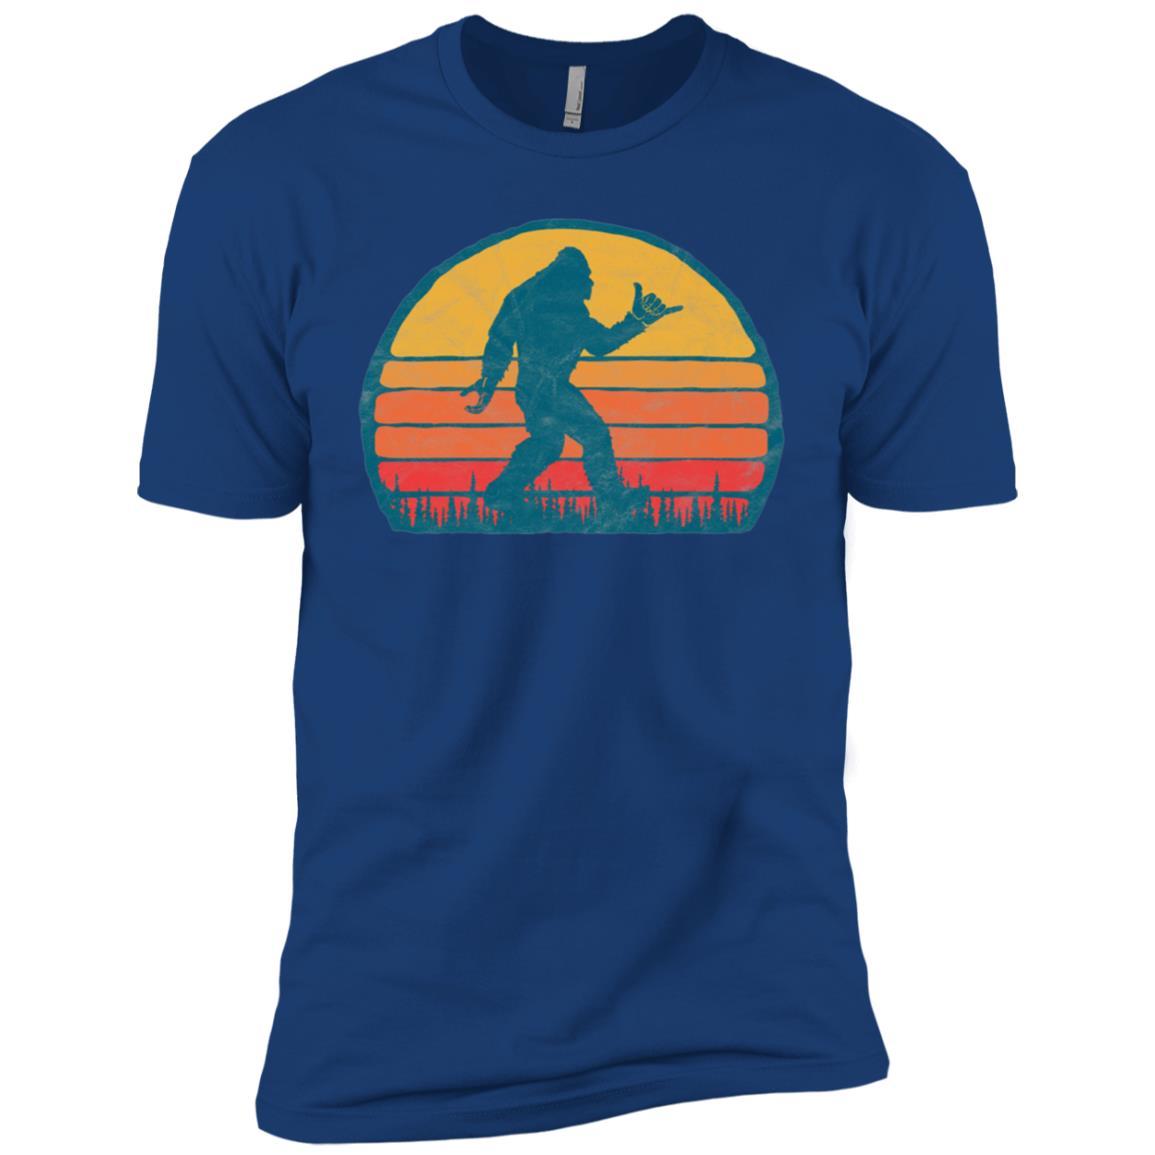 Funny Shaka Aloha Bigfoot Surfer – Believe Dude! Men Short Sleeve T-Shirt